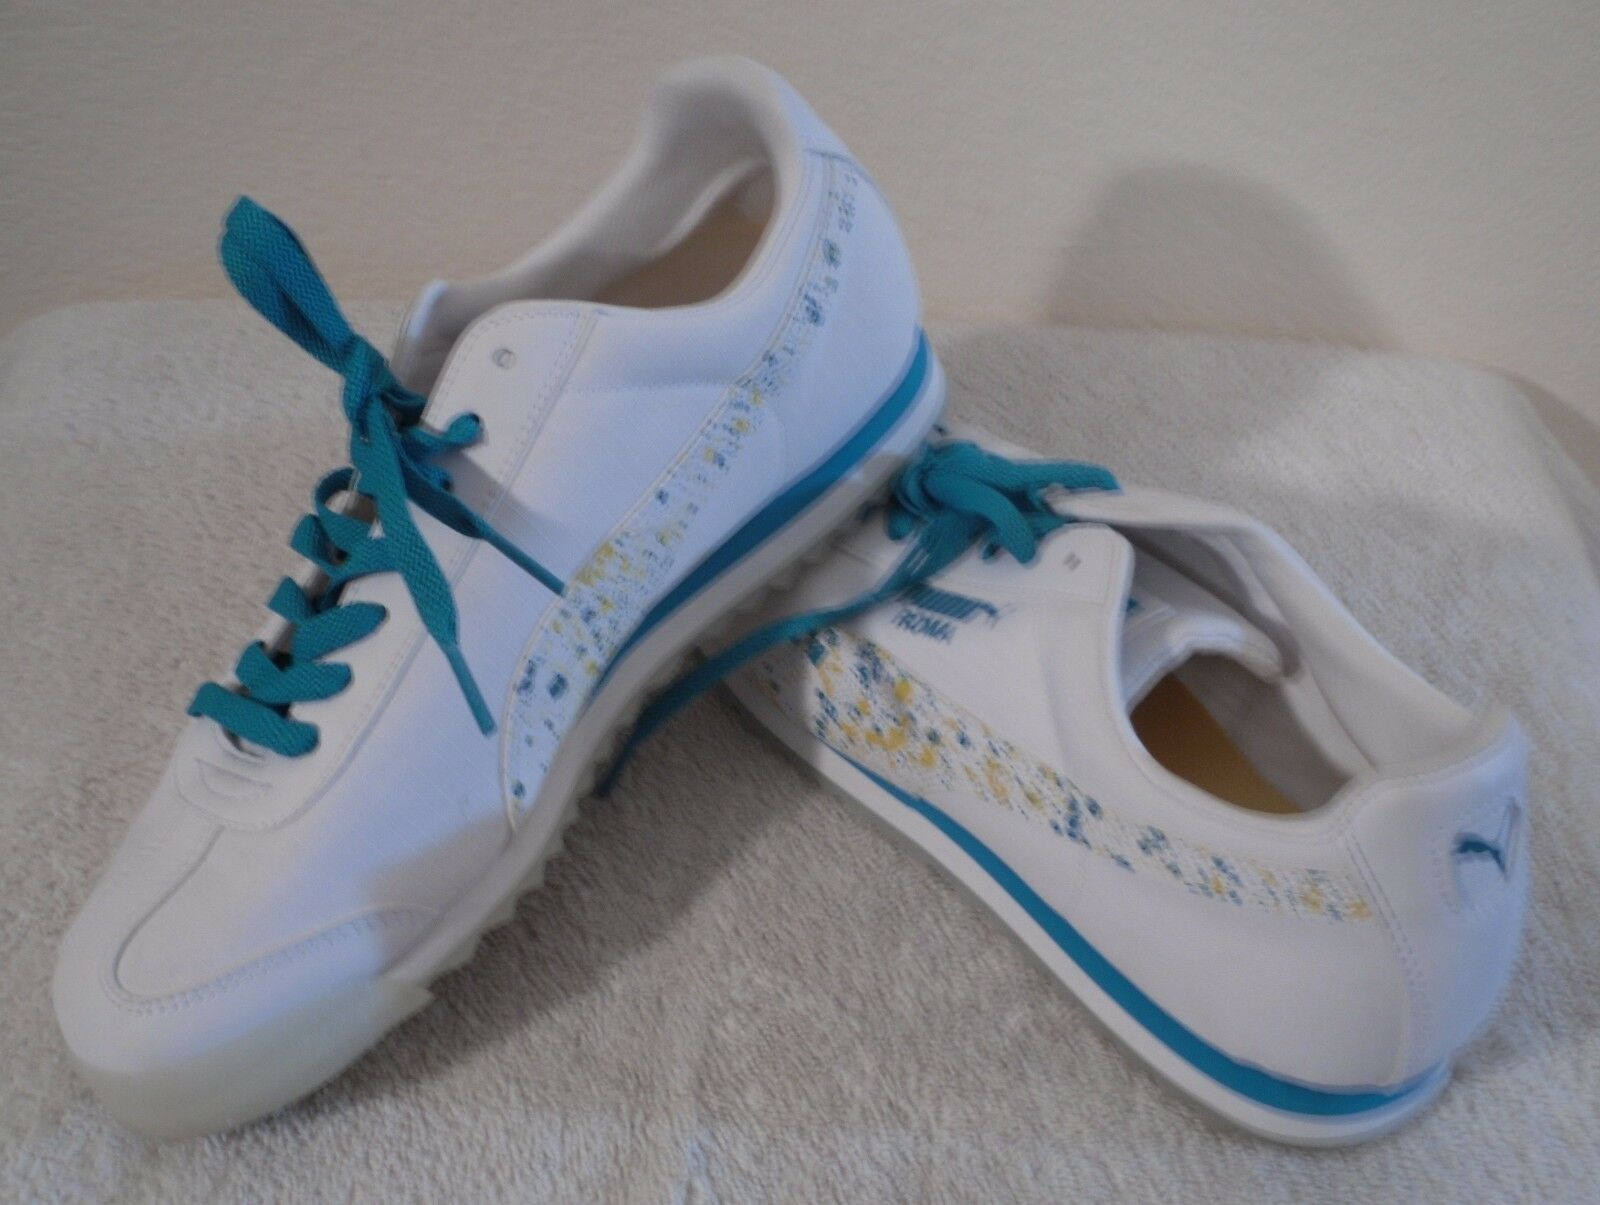 NEW PUMA Roma Ripstop Clear Womens Sneakers shoes 10.5 White Capri Breeze  80